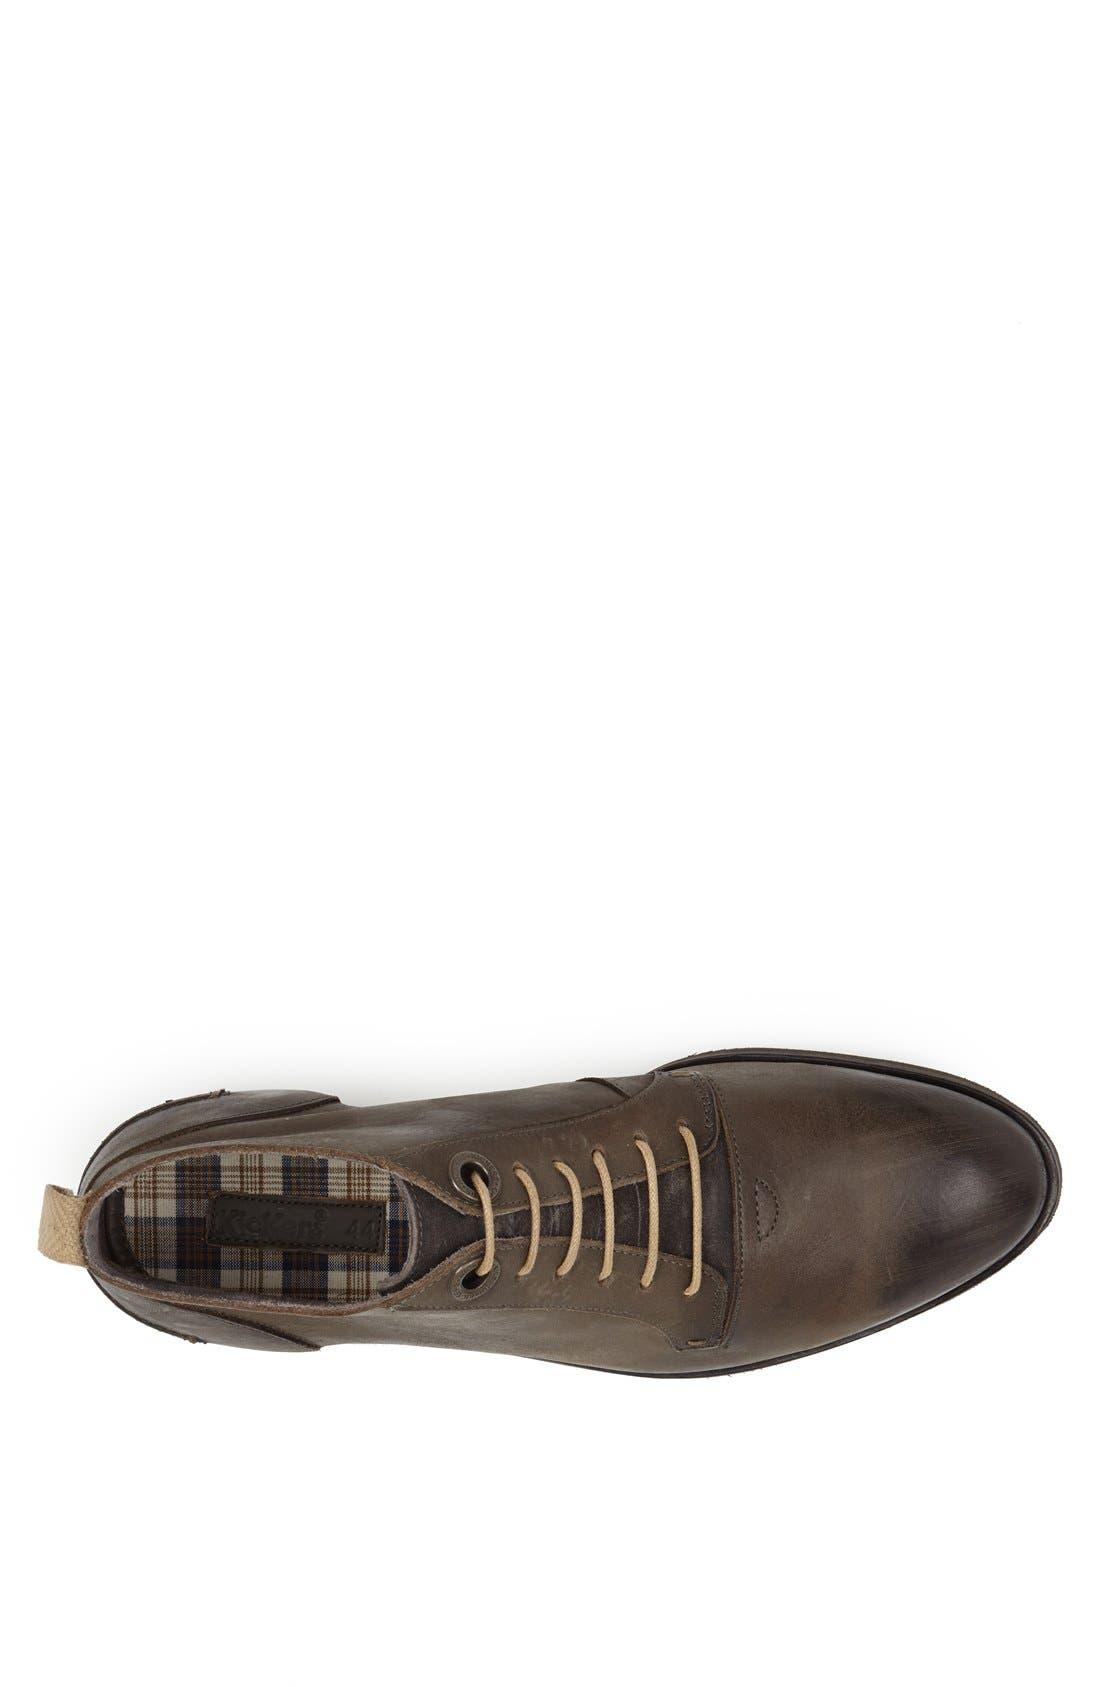 Alternate Image 3  - Kickers 'Darius' Plain Toe Boot